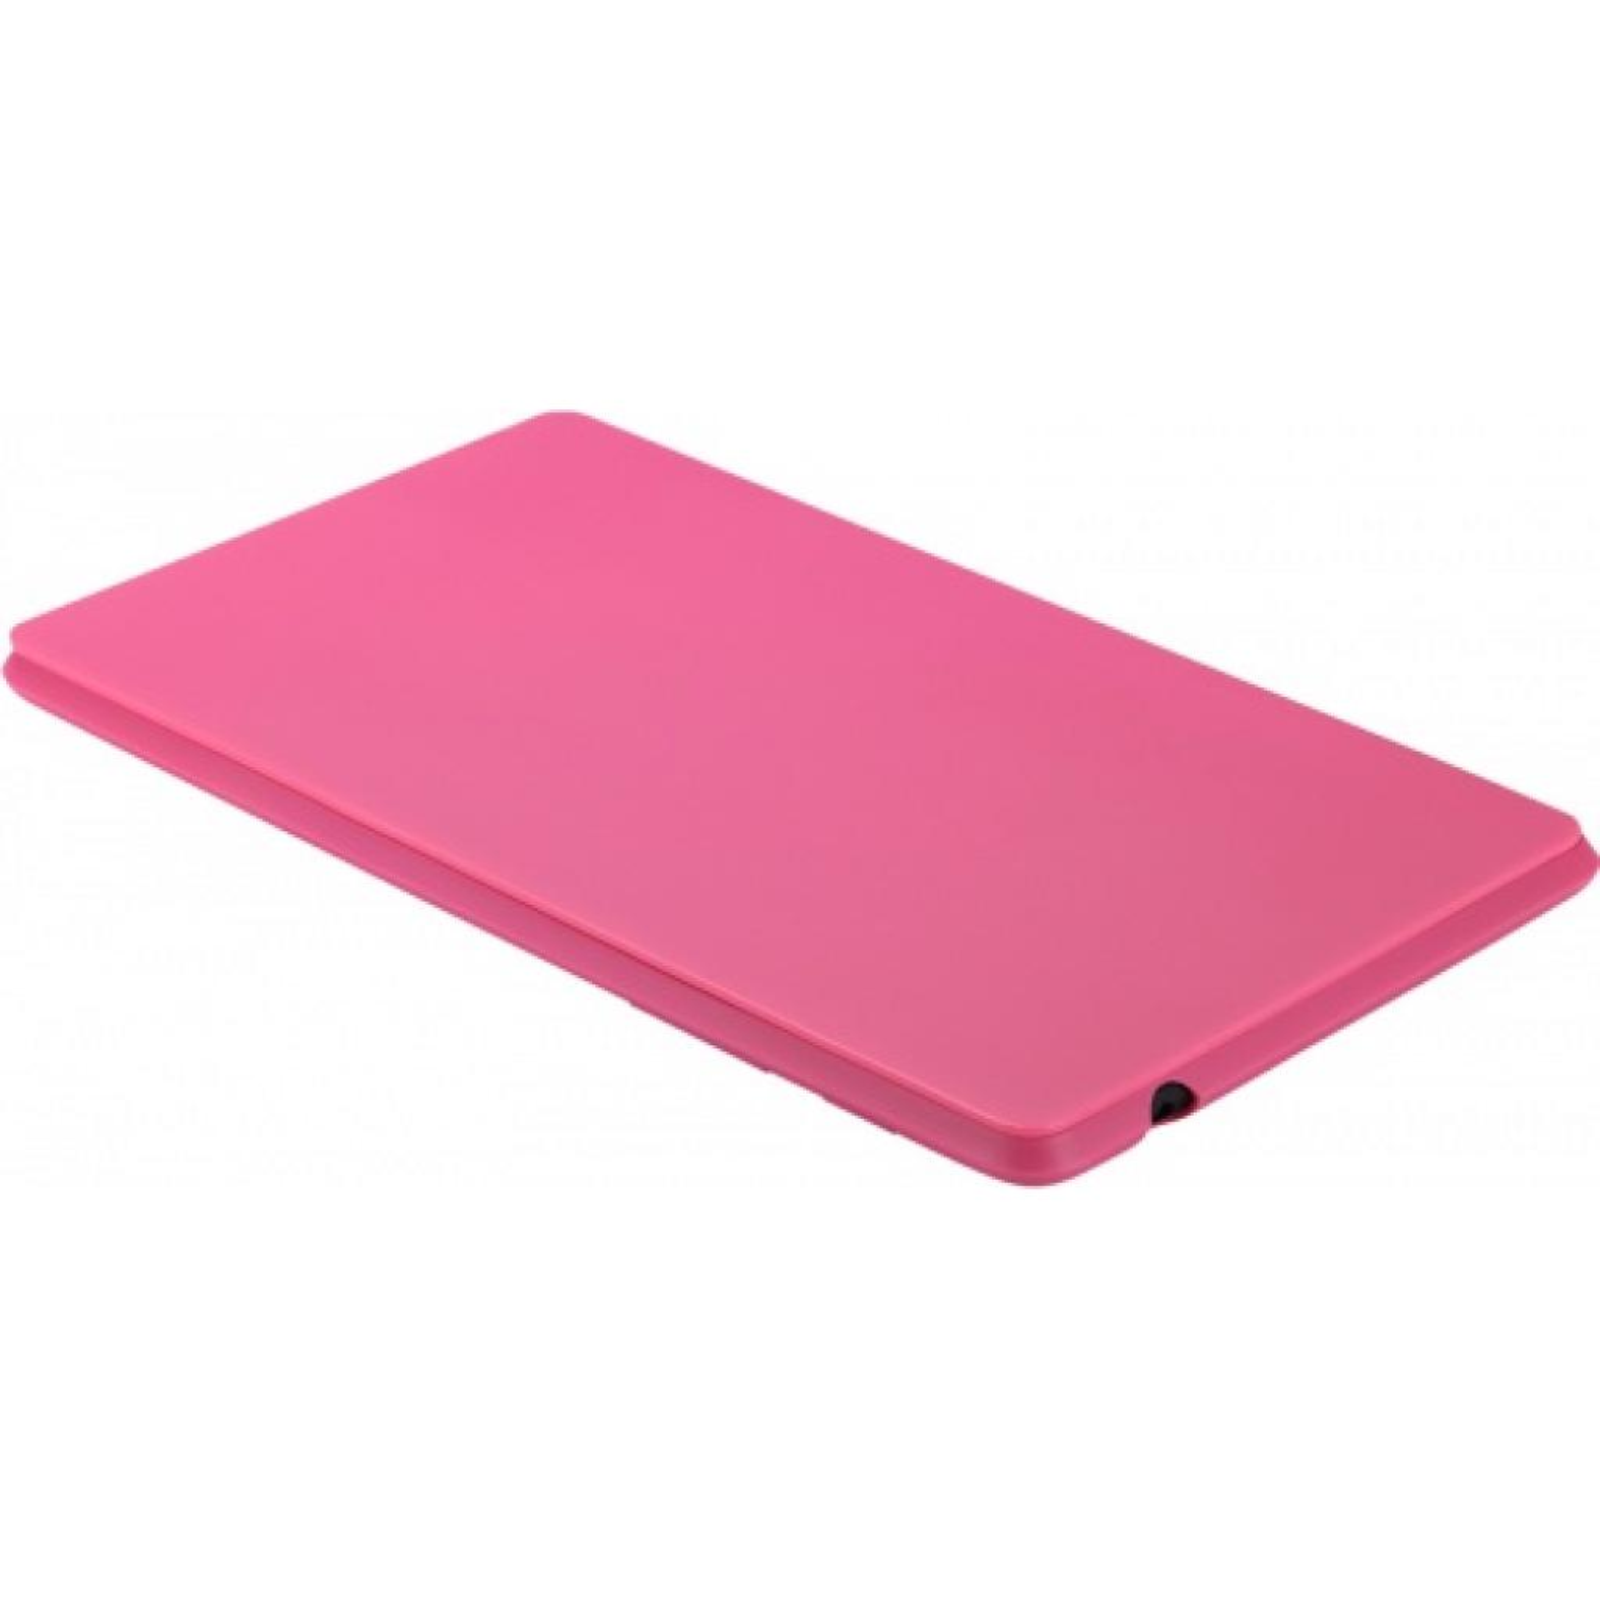 Чехол для планшета ASUS Nexus 7 2013 TRAVEL COVER V2 PINK (90-XB3TOKSL001P0-) изображение 5